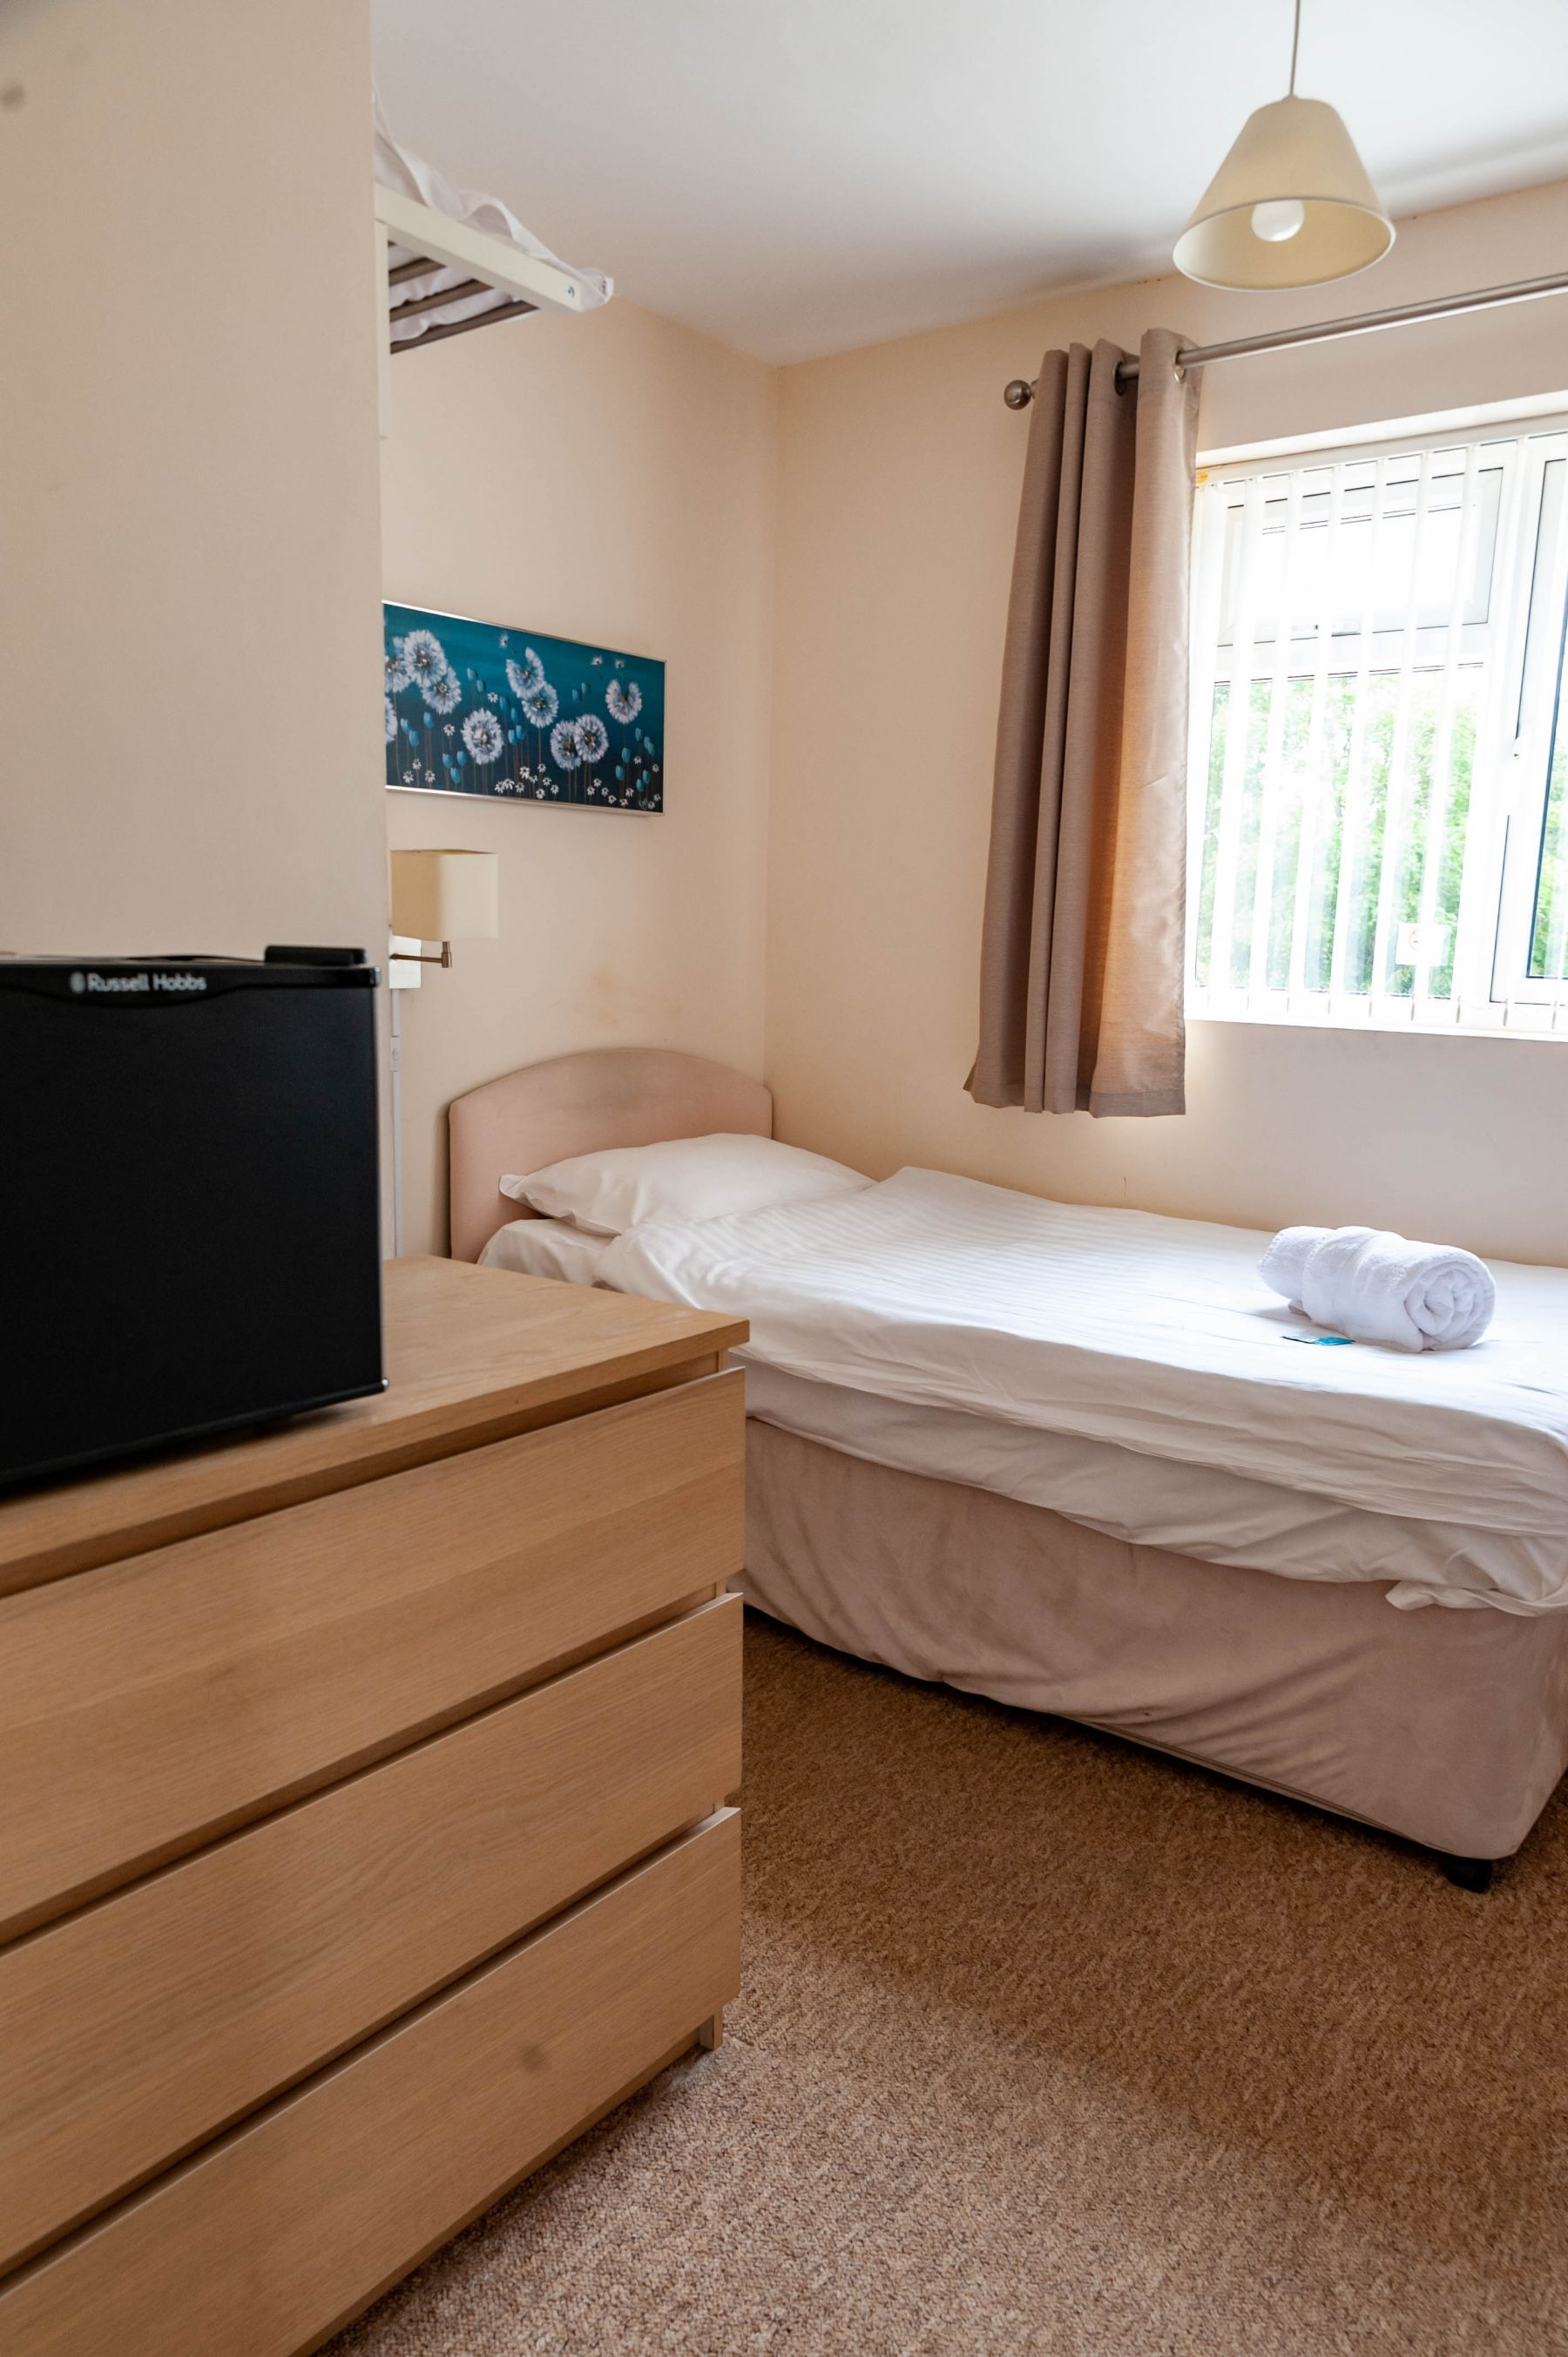 Standard single room, located upstairs